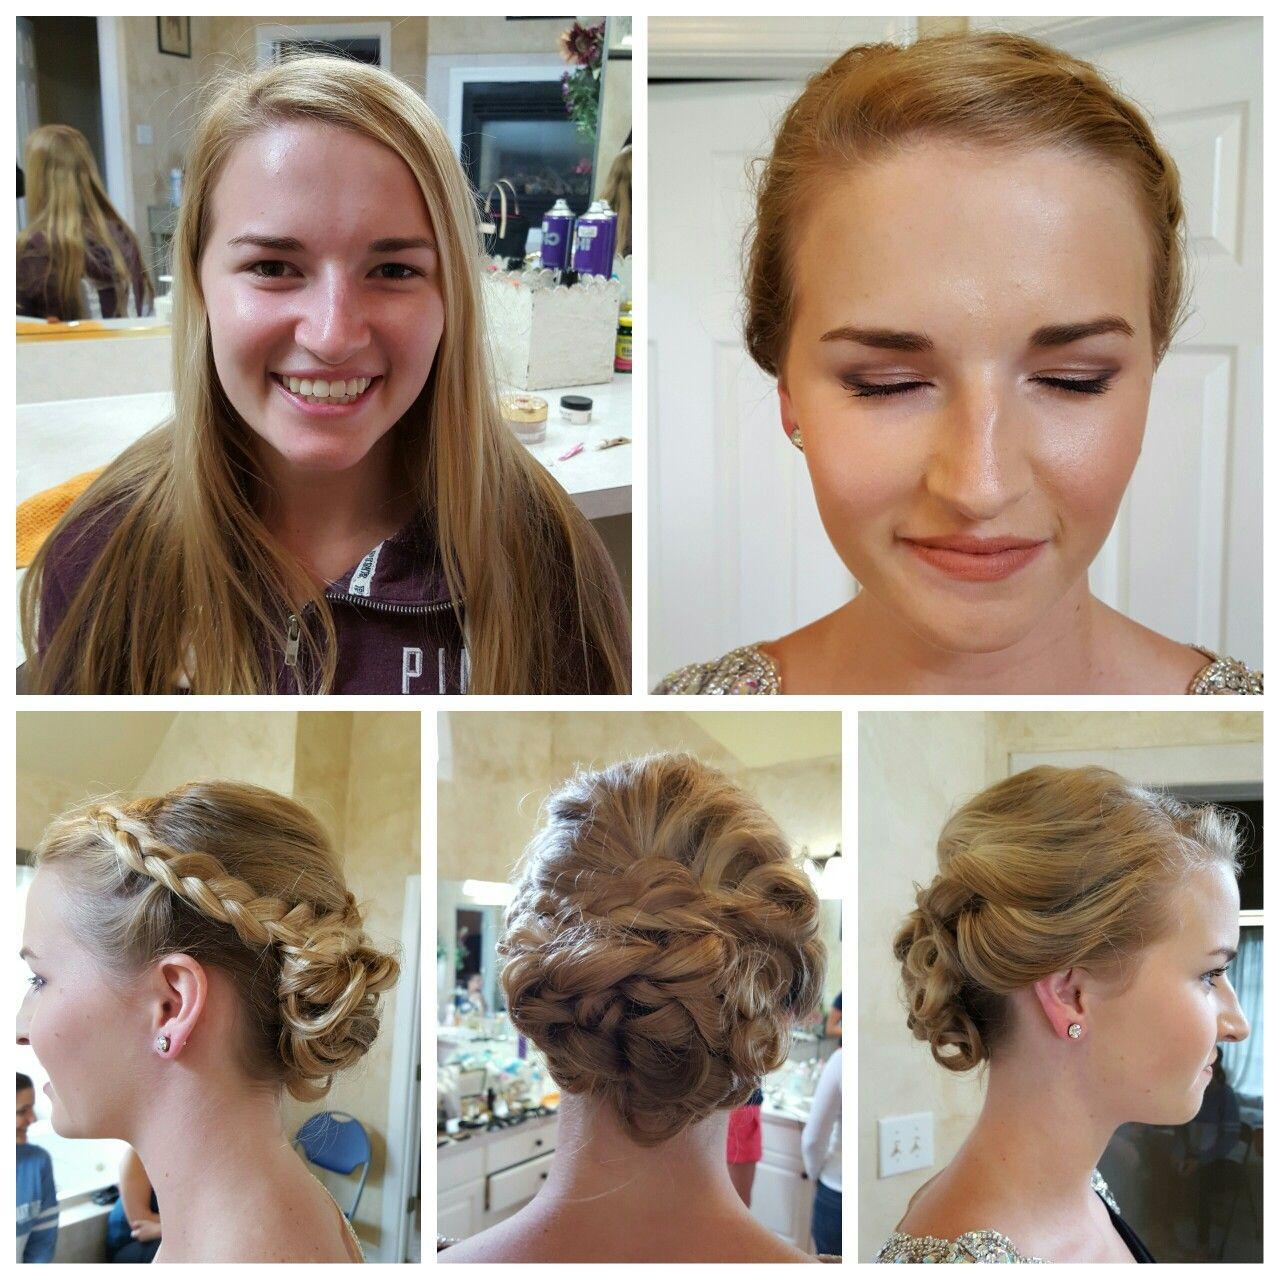 Skyler Smithfield prom makeup and hair Queen makeup